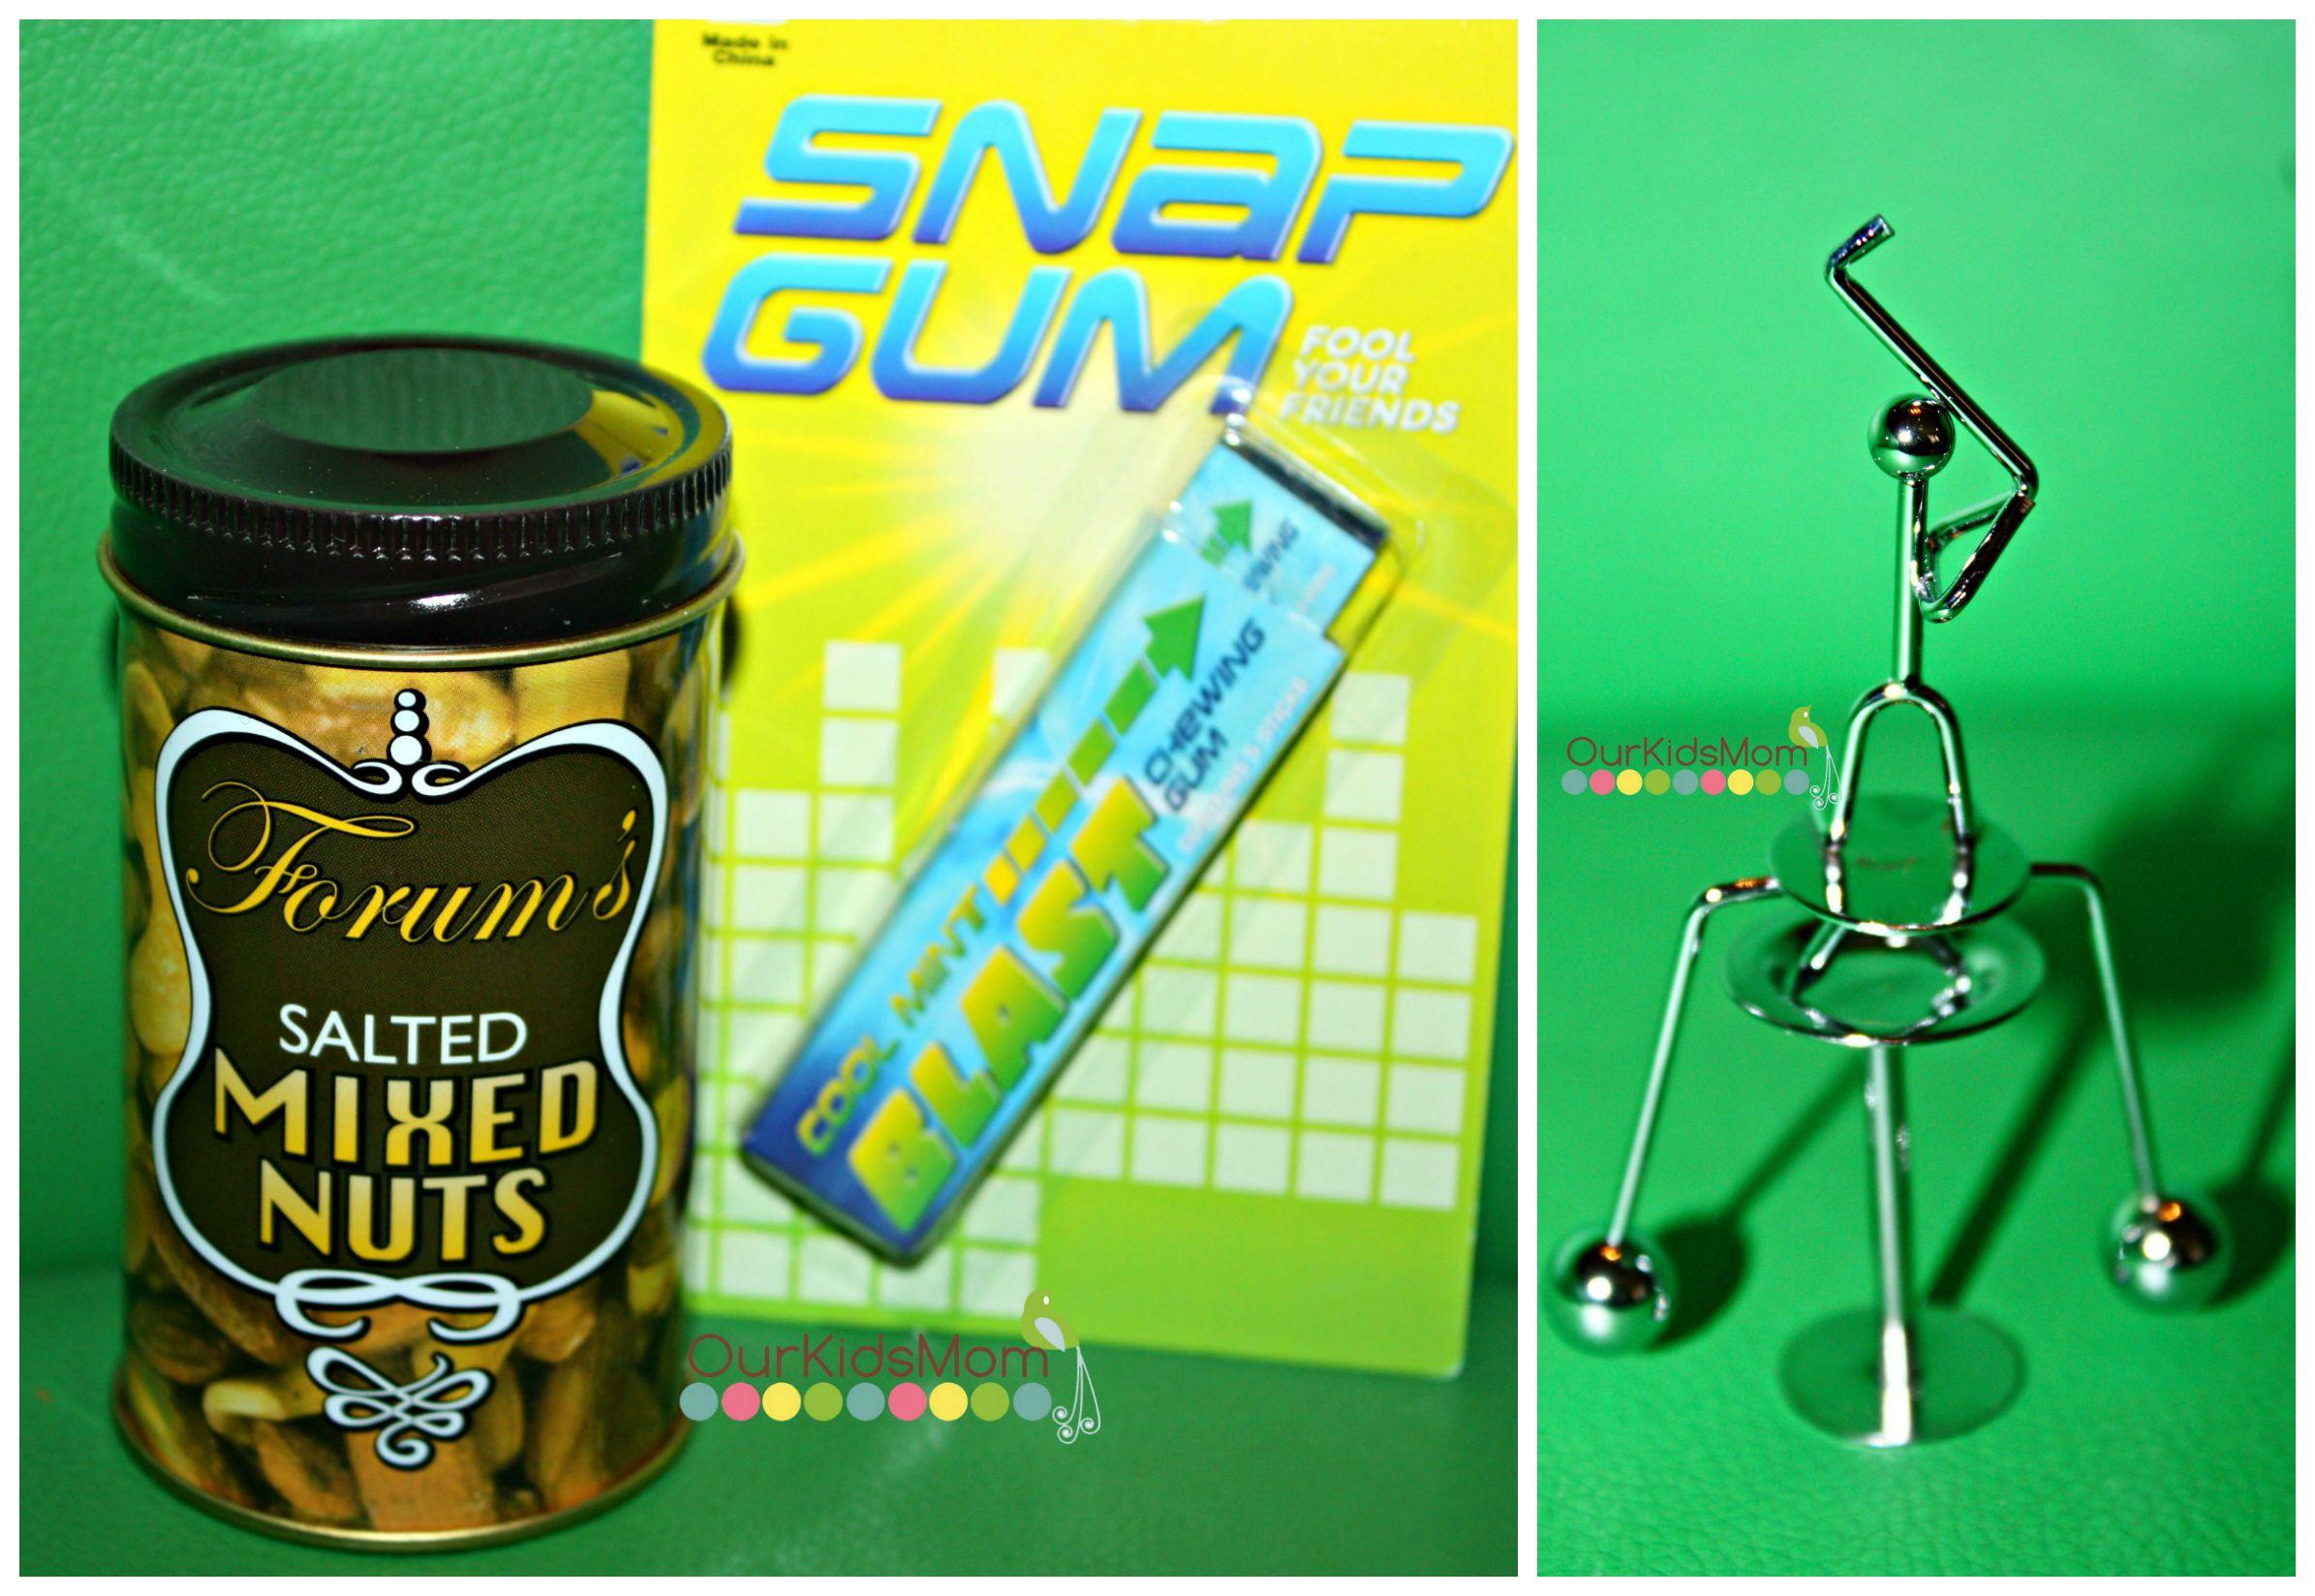 Snap Gum, Nuts in tin can joke, balancing golfer